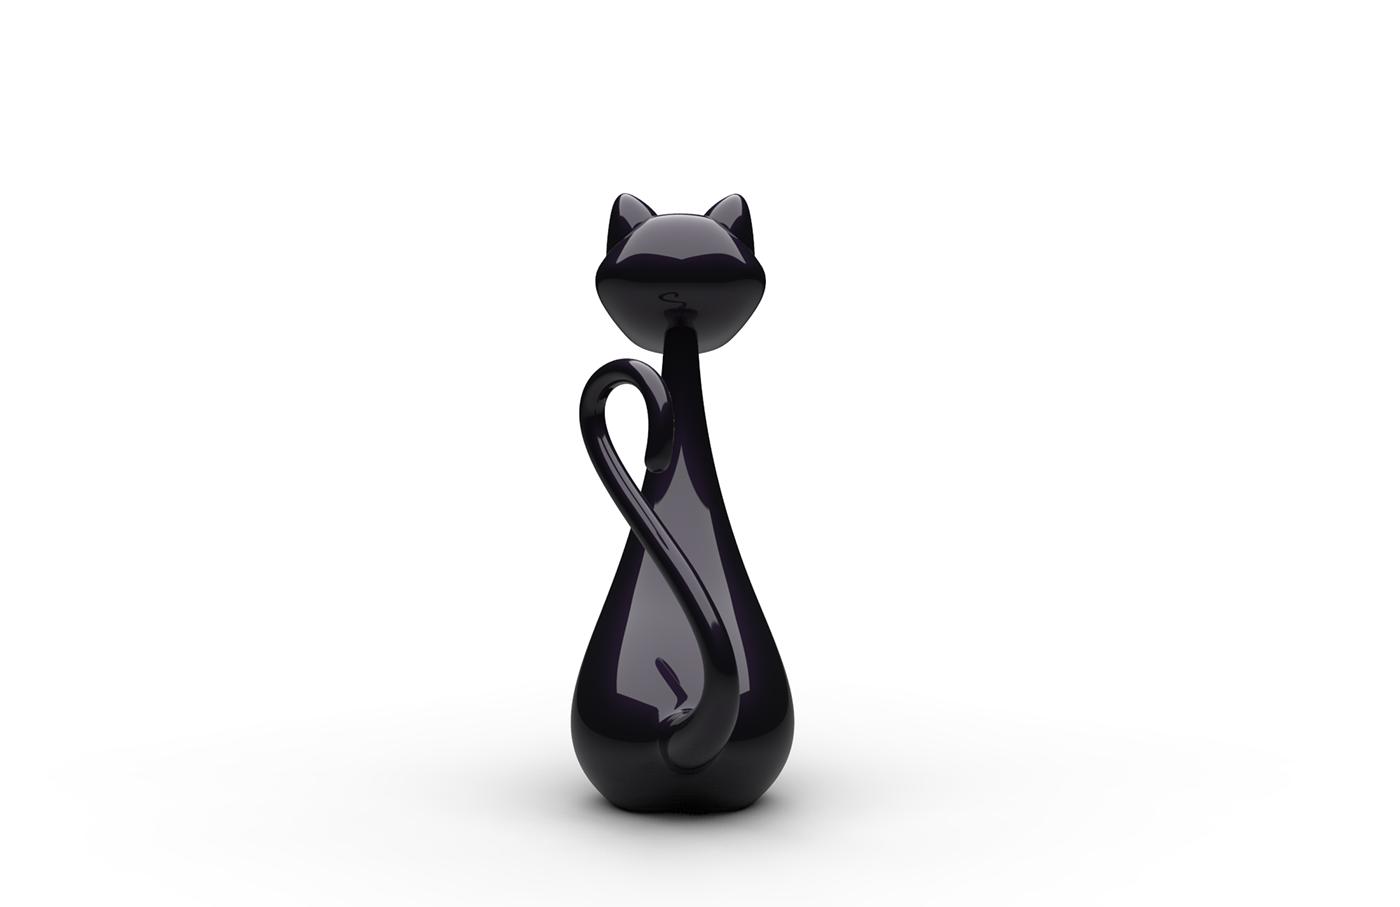 Cat 3D 3dmodeling Accessory Alias keyshot